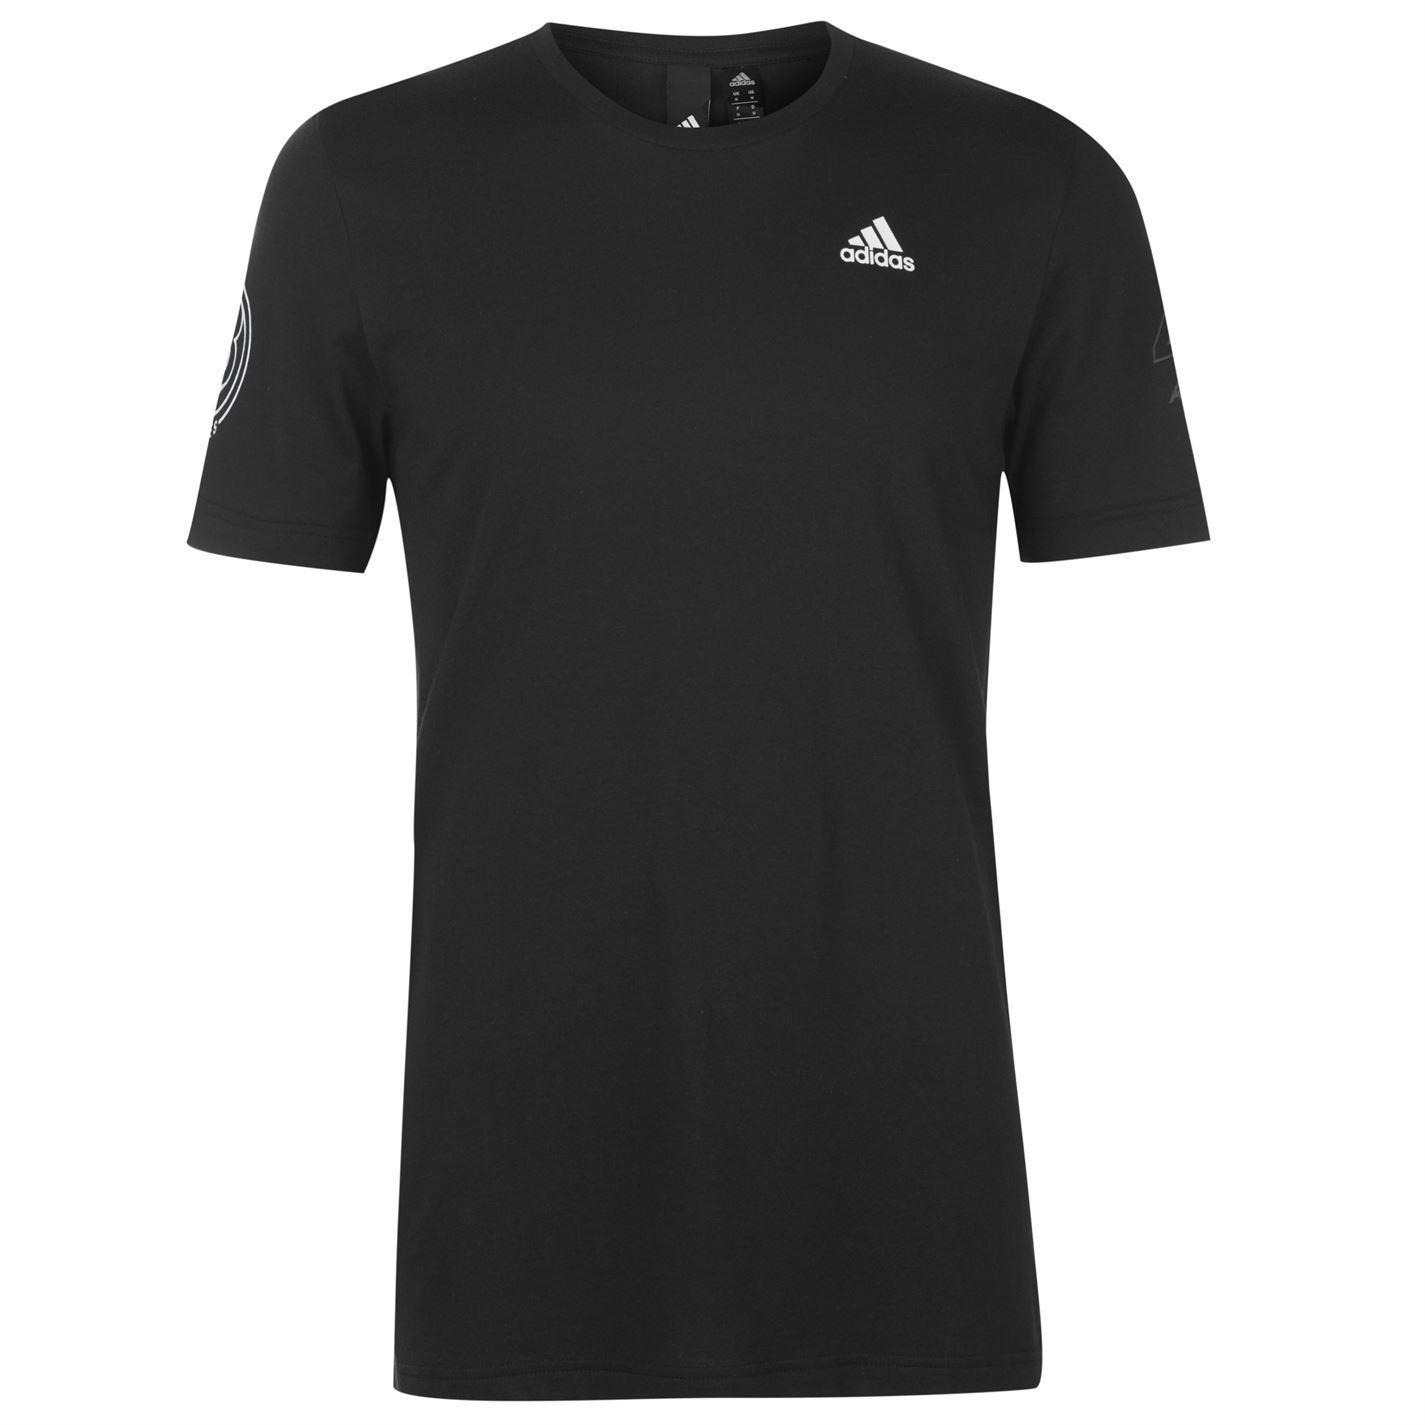 Adidas Sport ID 360 T Shirt Mens